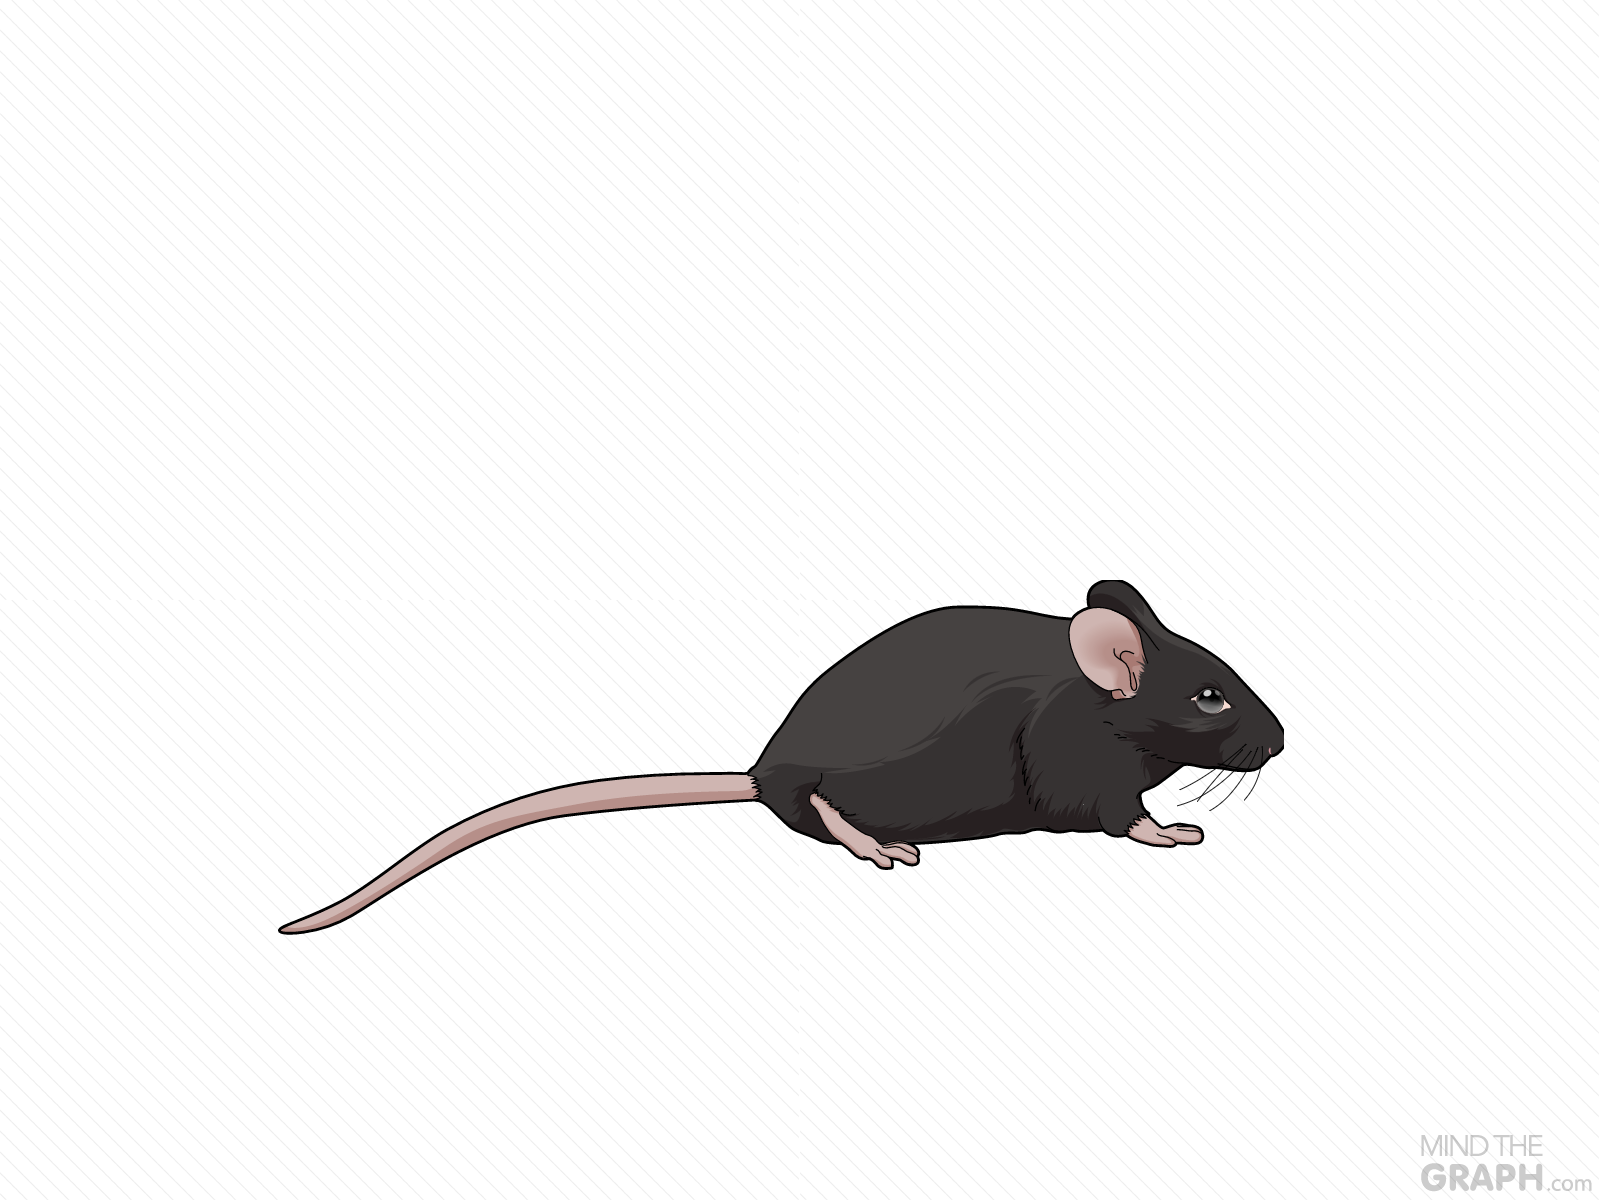 mouse c57